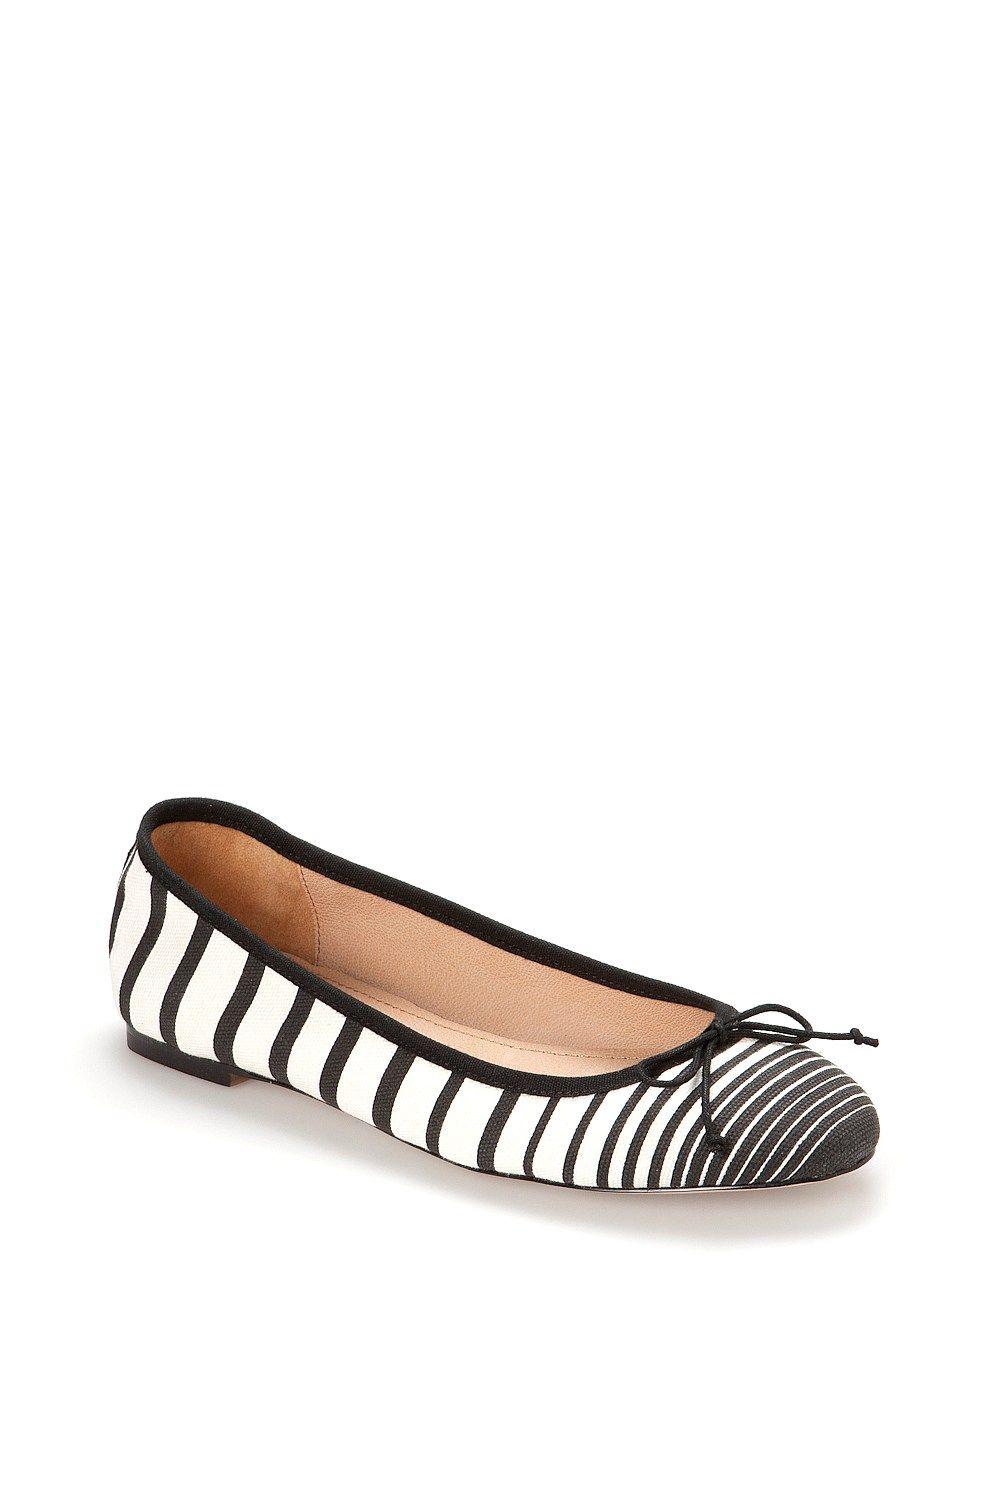 Country Road Women's Flat Shoes Online Textile Ballet